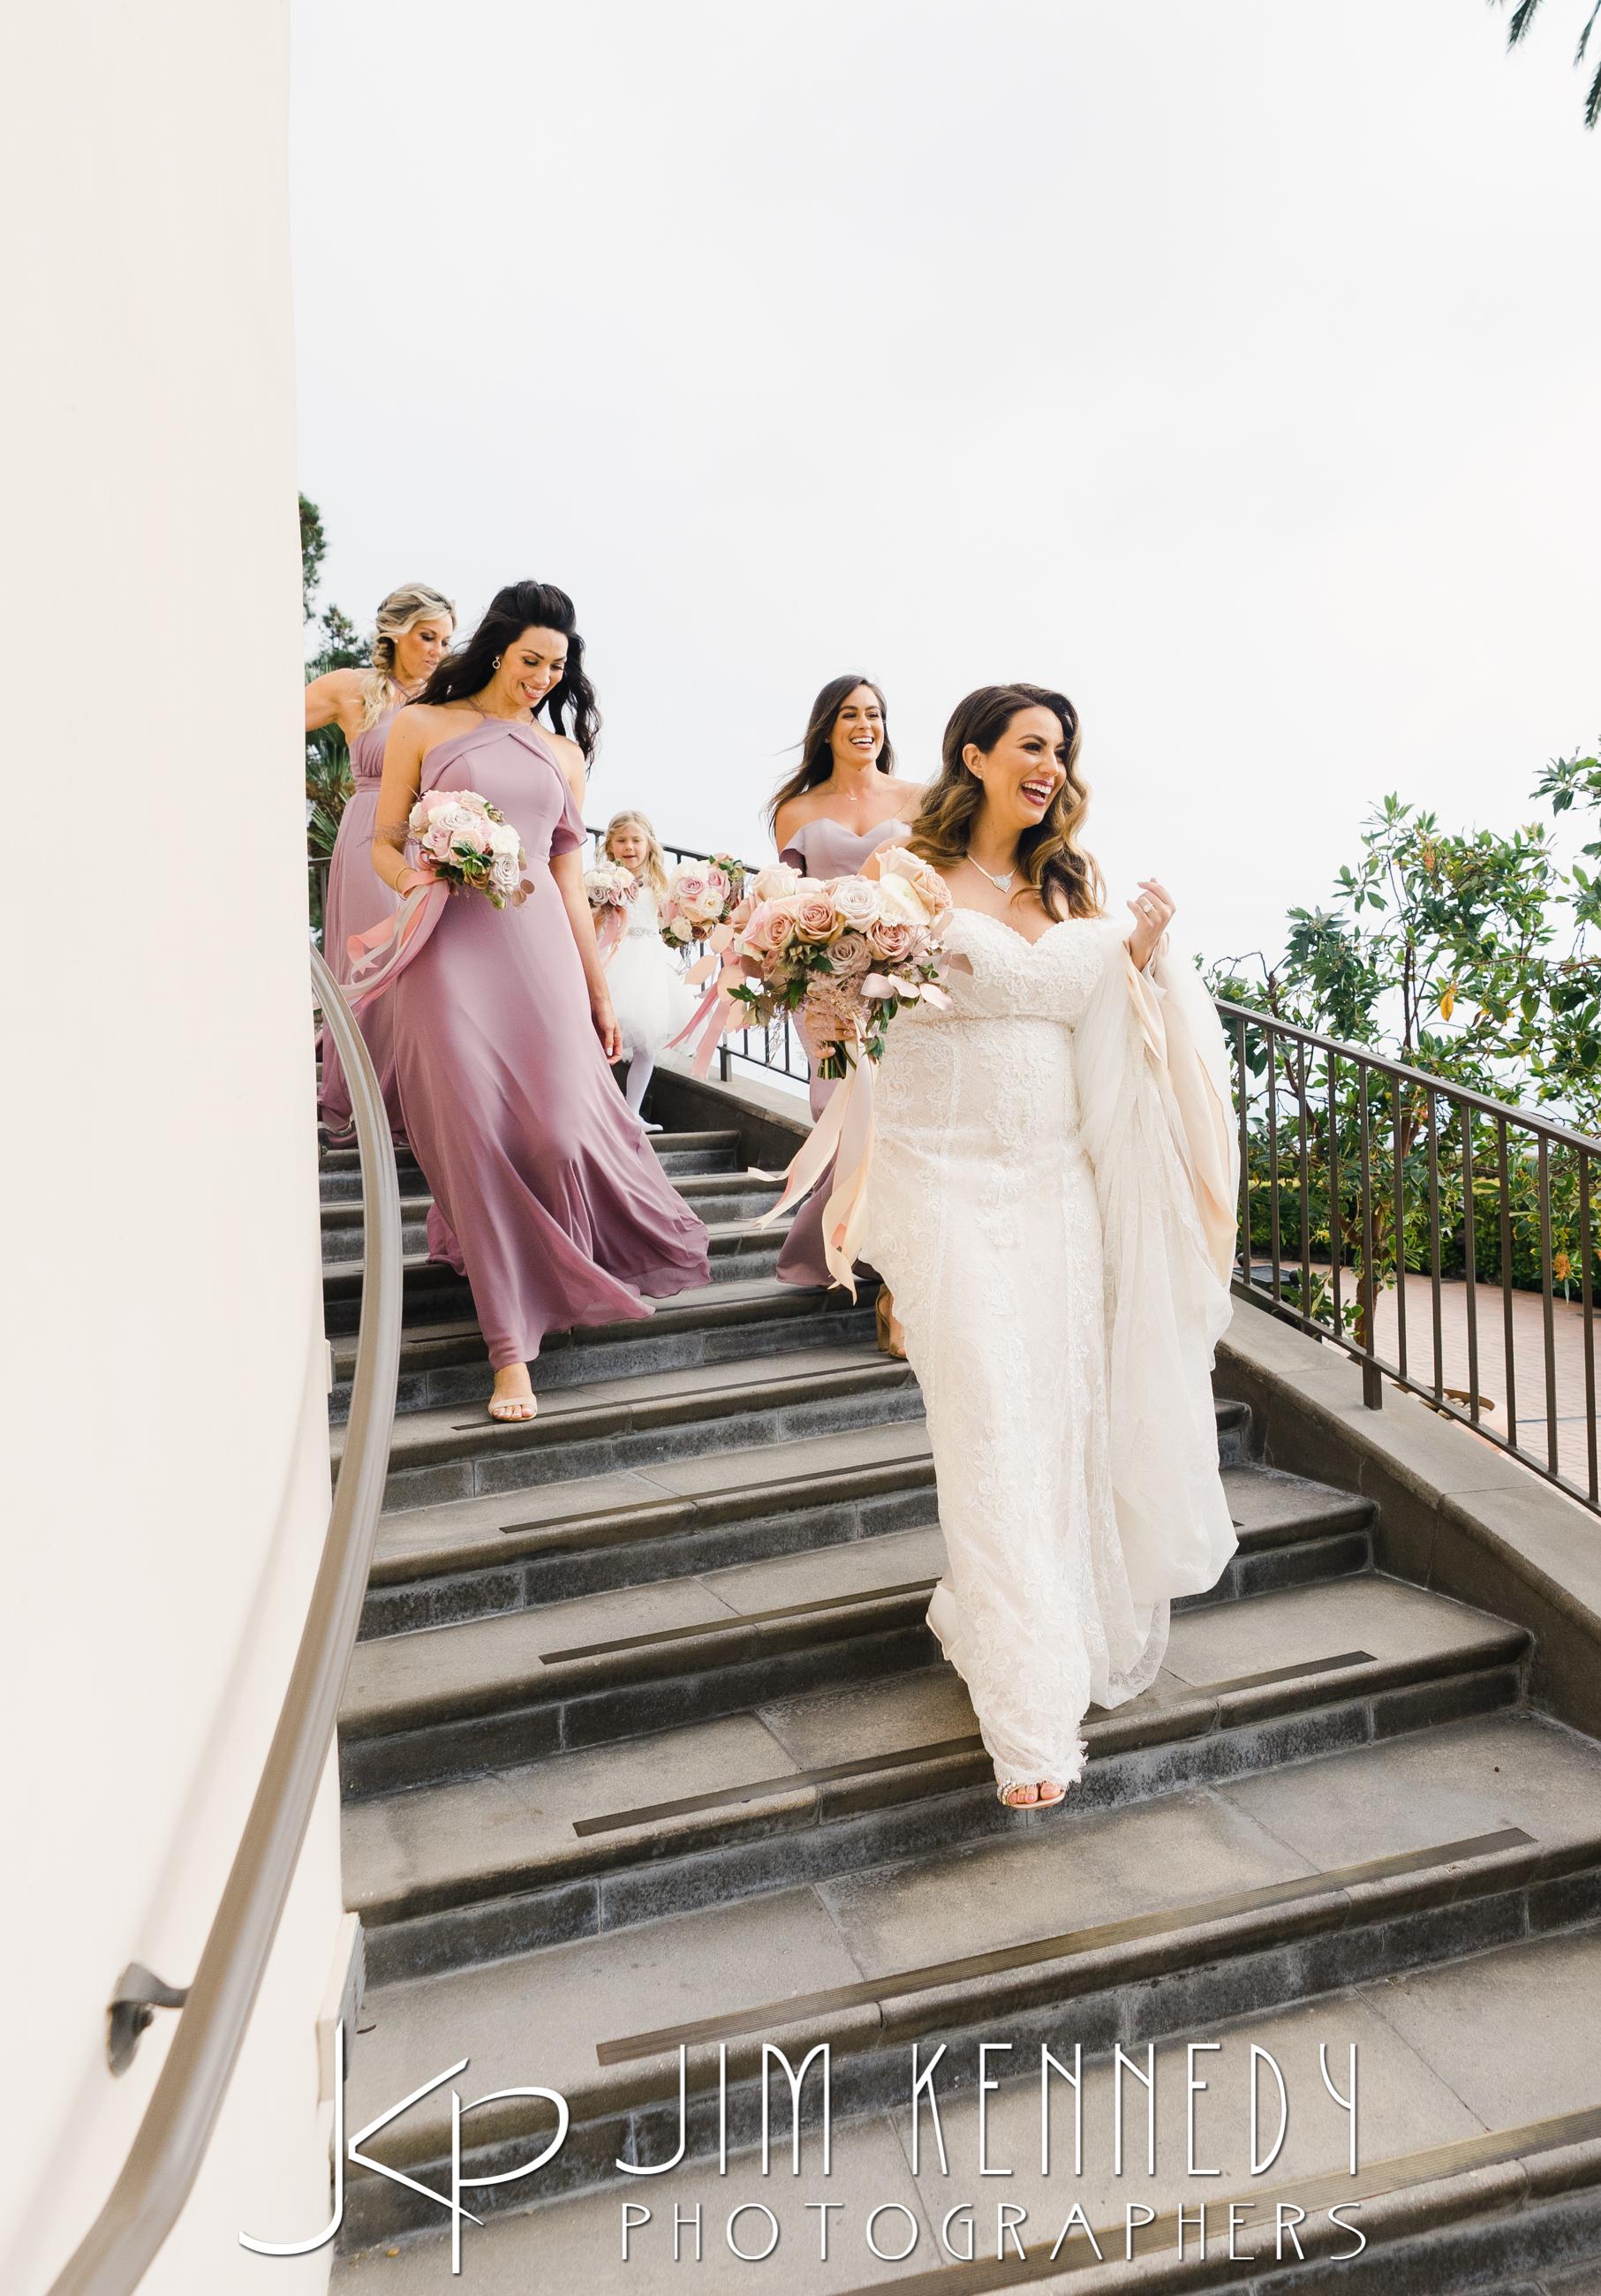 pelican-hill-wedding-jim-kenedy-photographers_0077.JPG